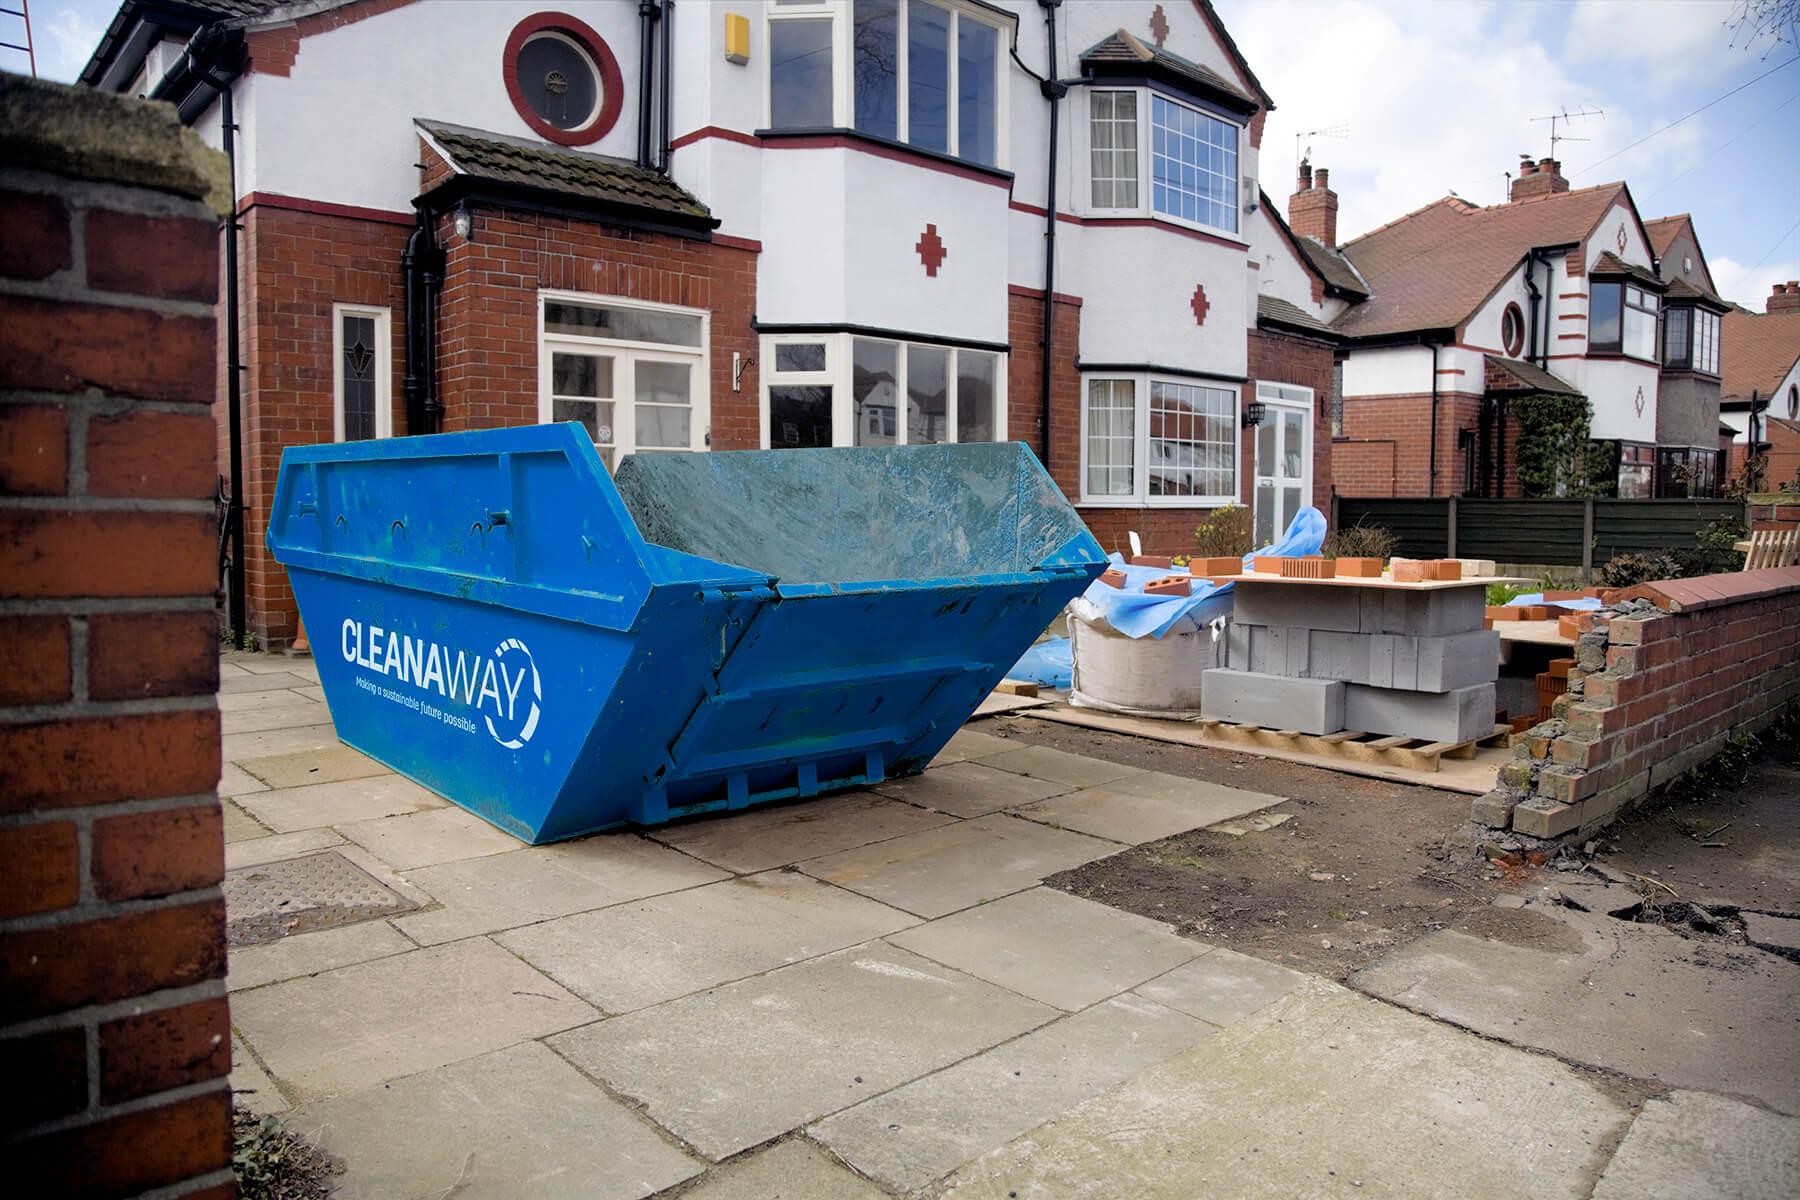 Cleanaway skip bin in the driveaway